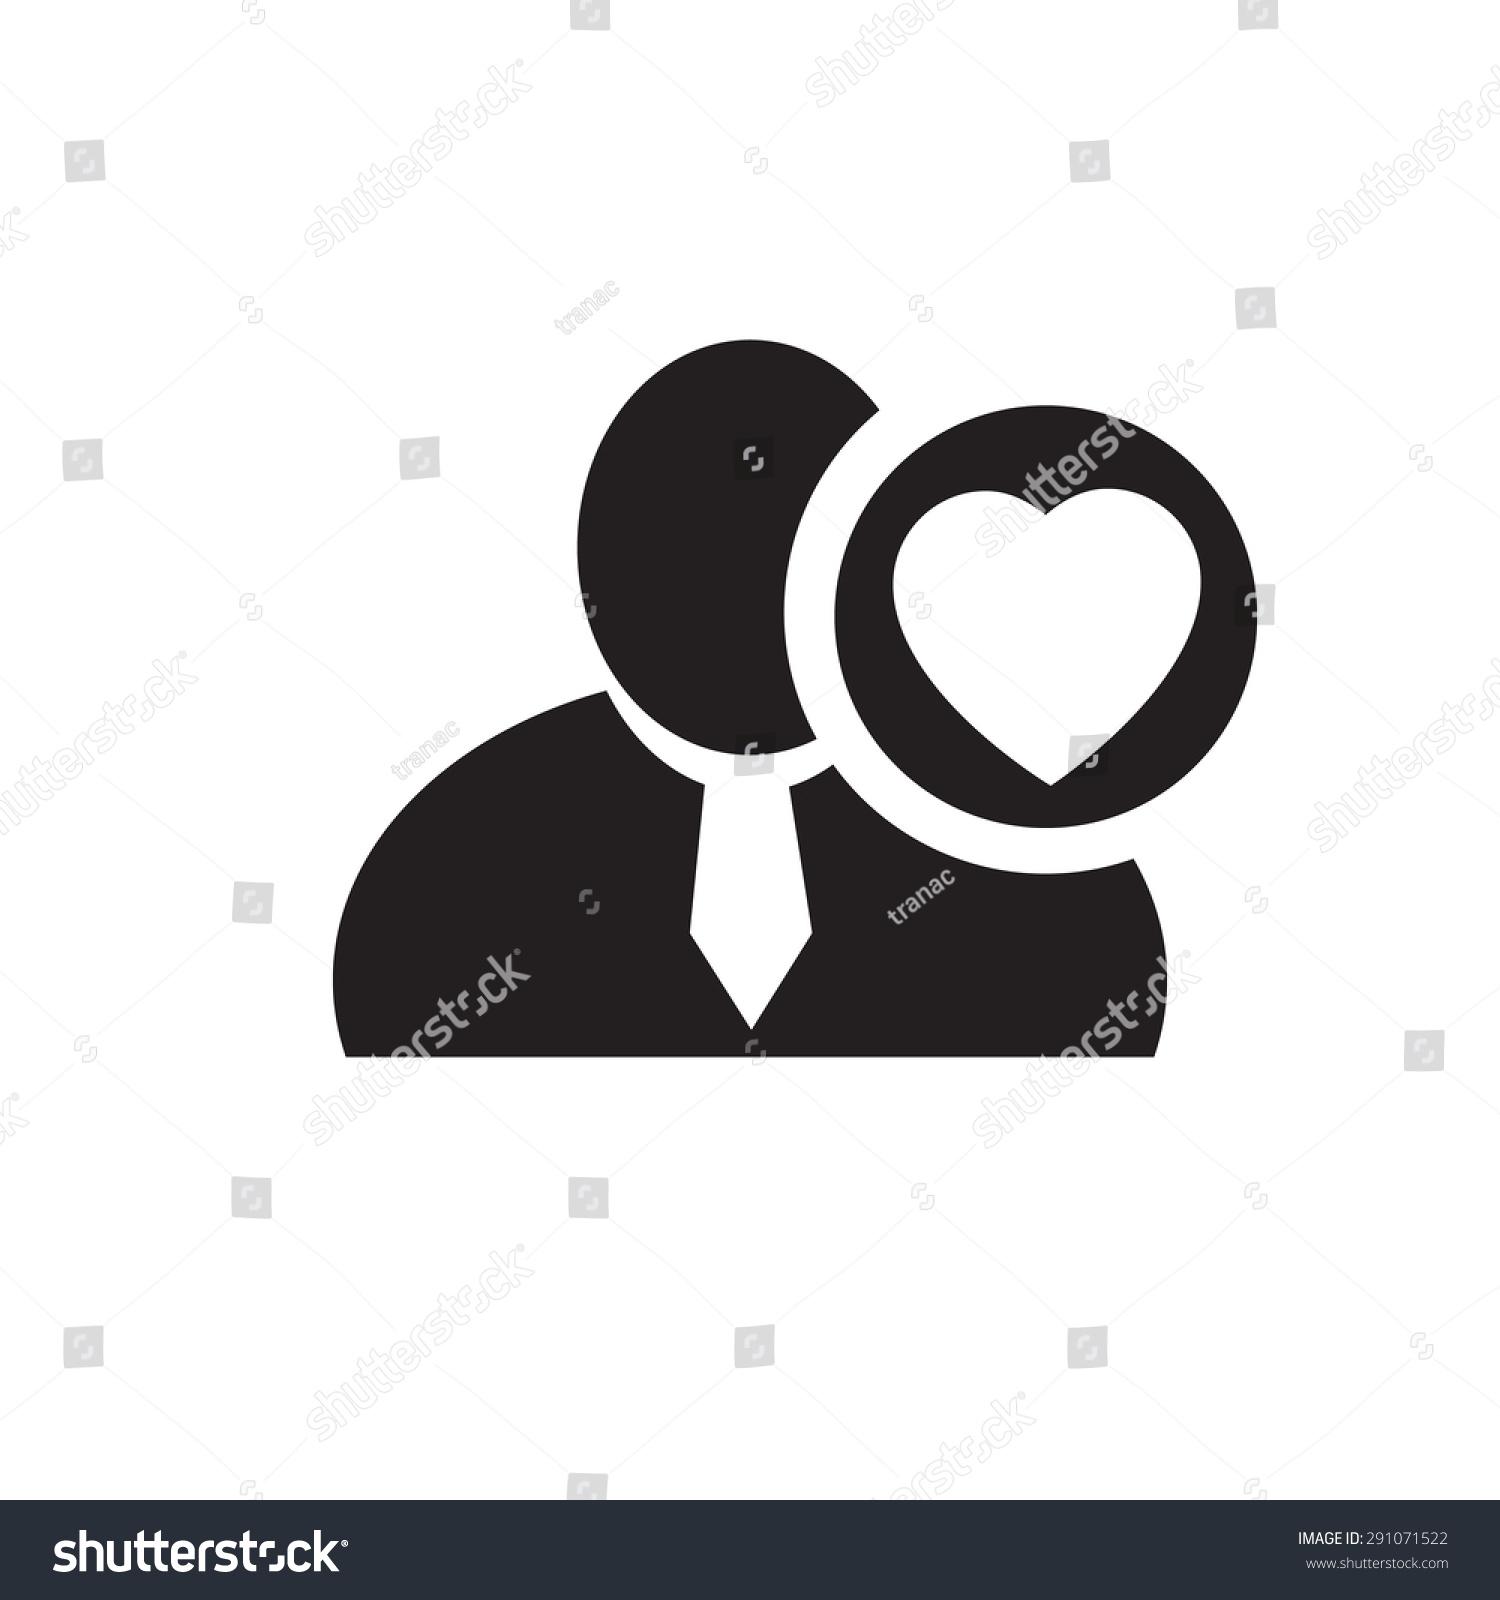 Black man silhouette icon heart love stock vector 291071522 black man silhouette icon with heart love symbol in an information circle flat design icon buycottarizona